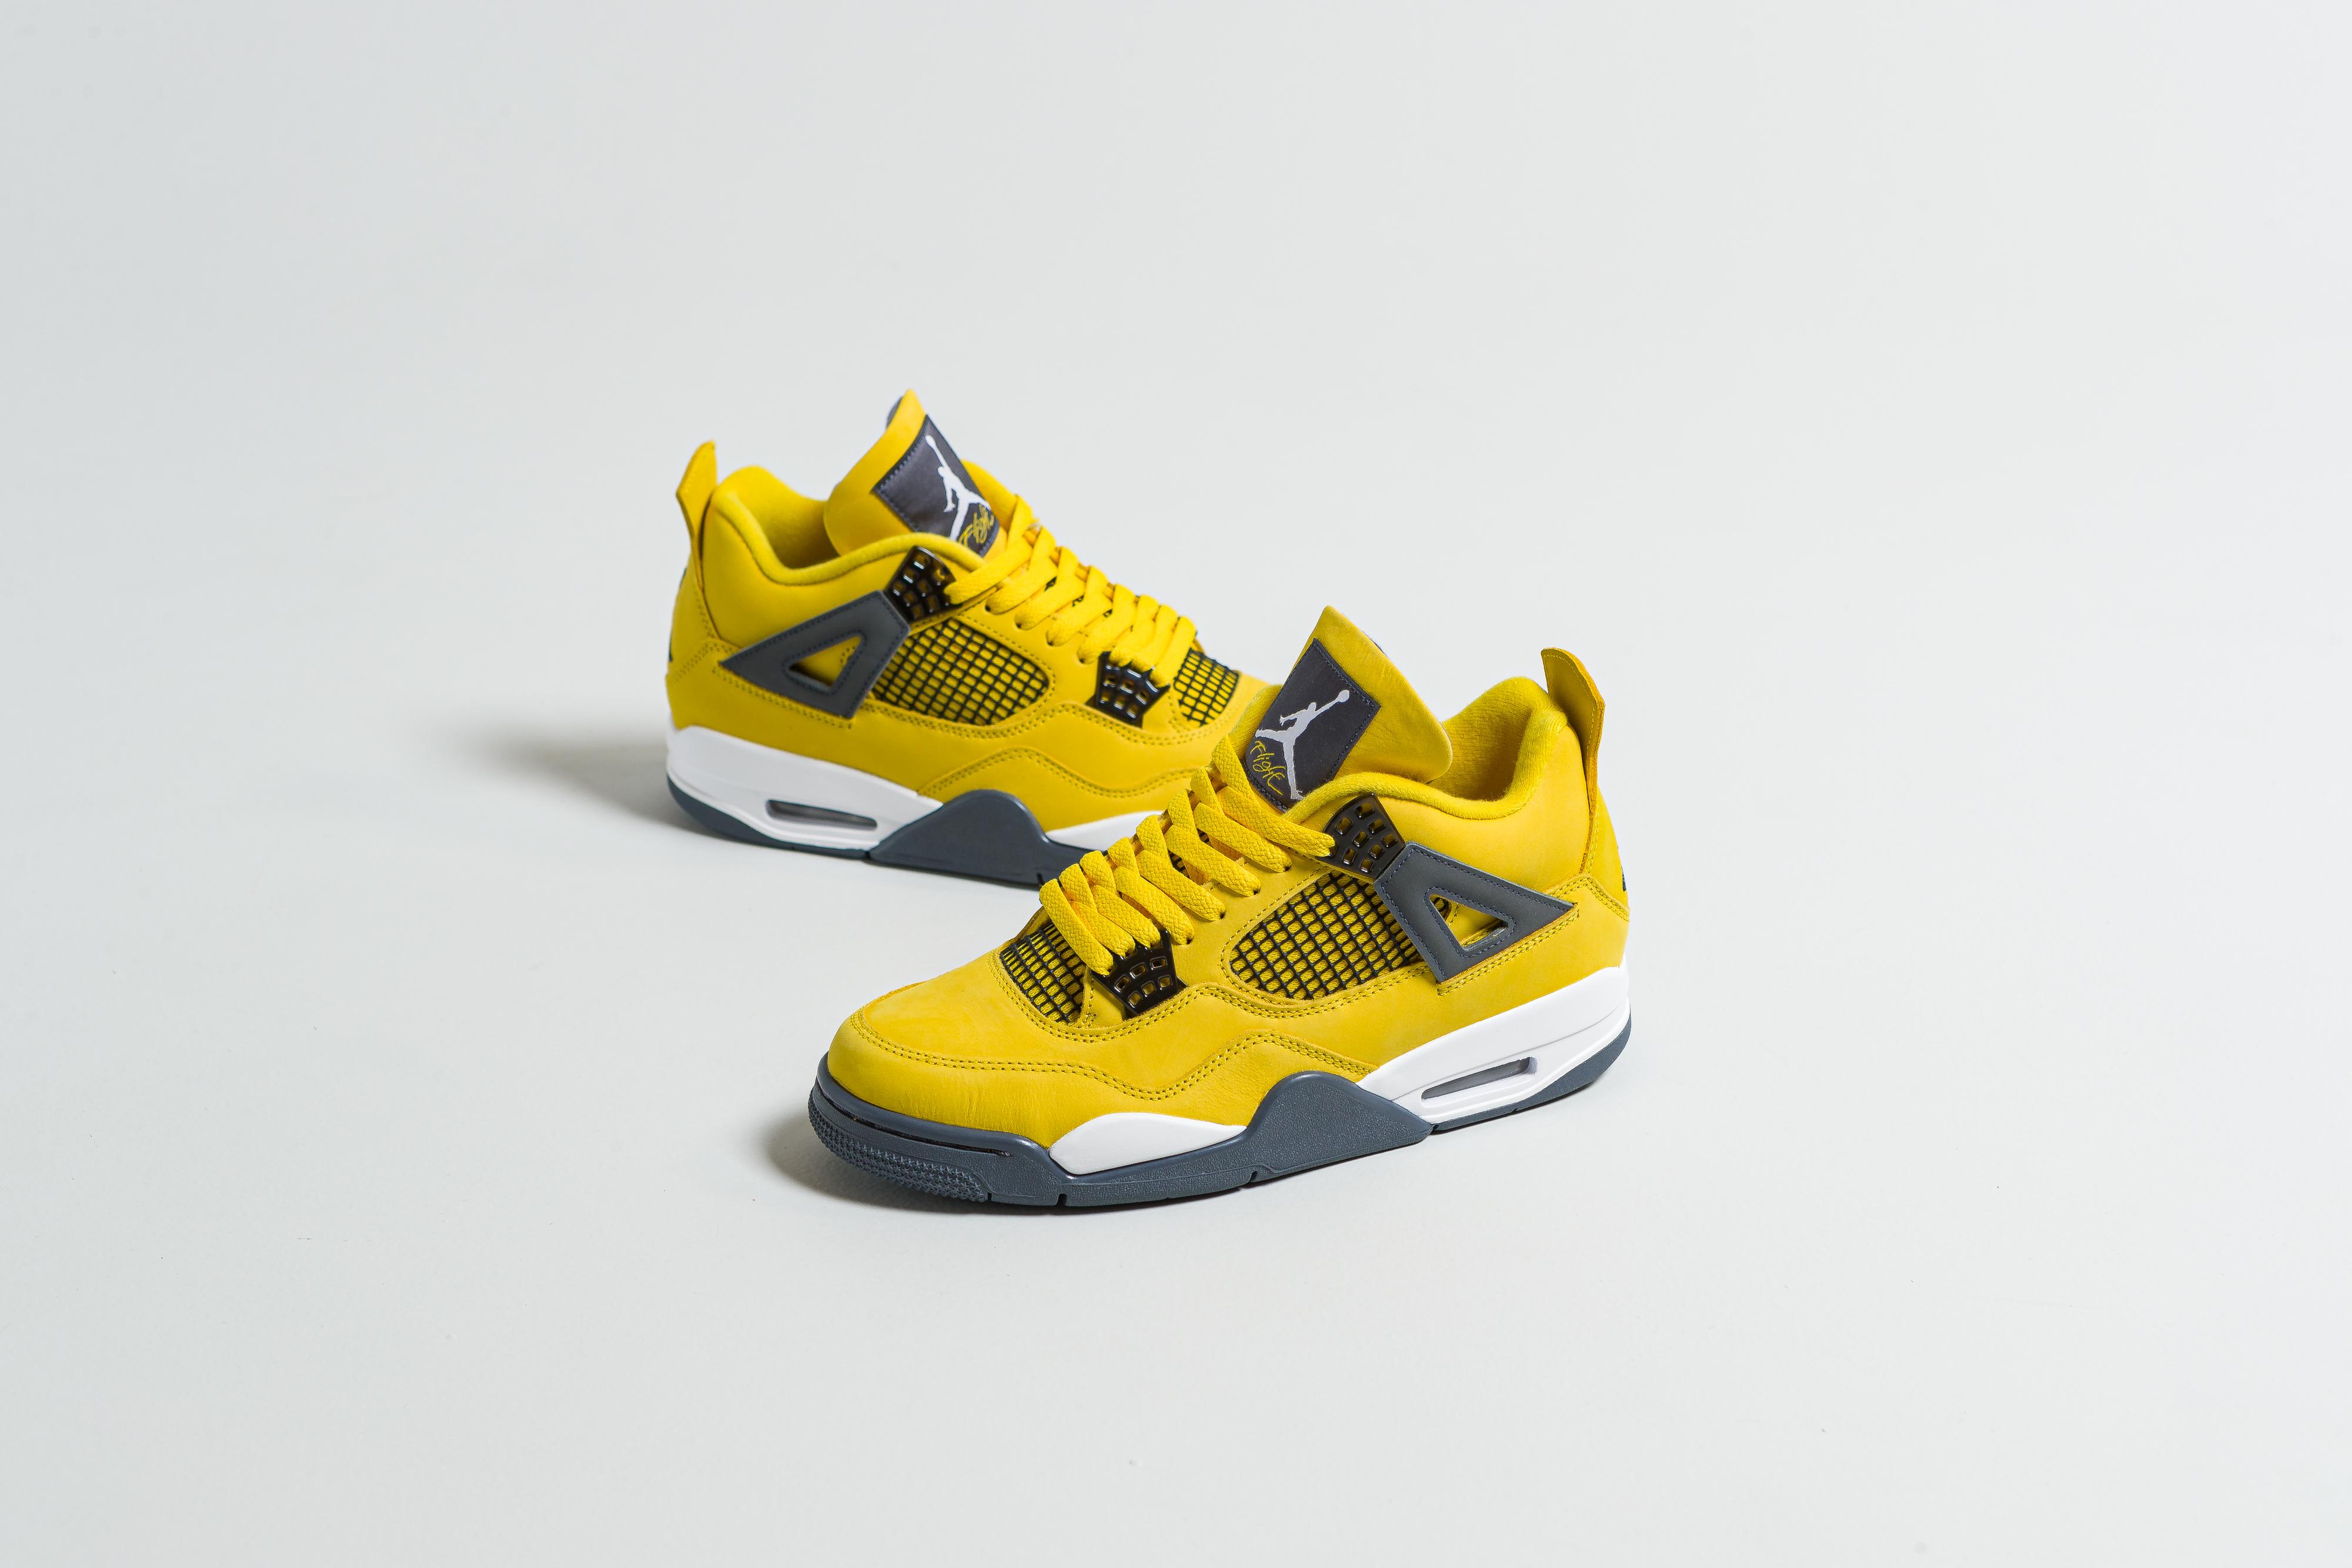 Jordan - Air Jordan 4 Retro - Tour Yellow/Dark Blue Grey-White - Up There